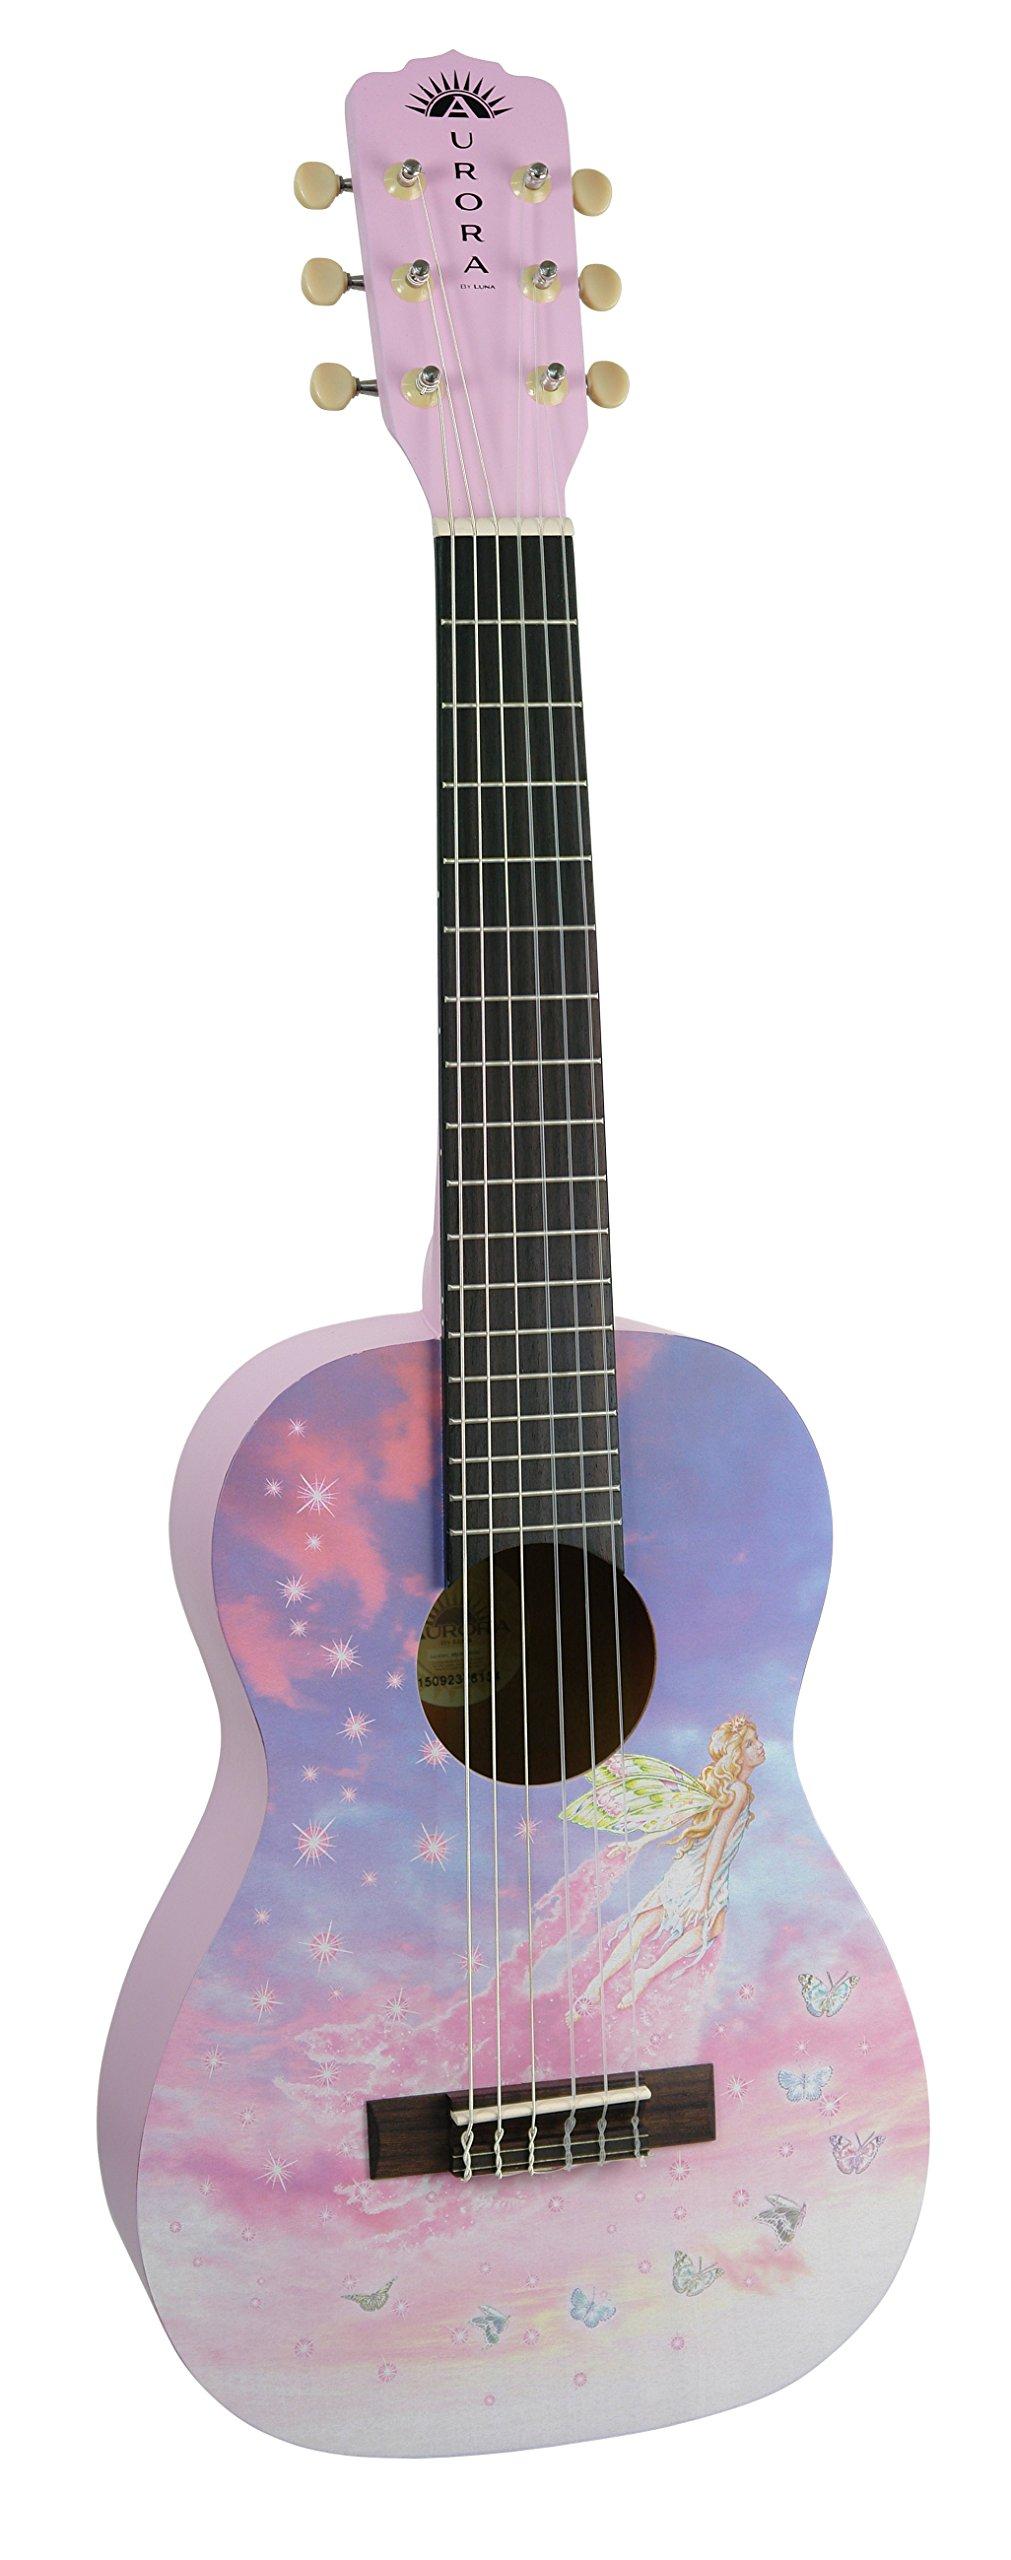 Luna AR2 NYL FAERIE Aurora 1/2 Acoustic Guitar, Nylon Faerie by Luna Guitars